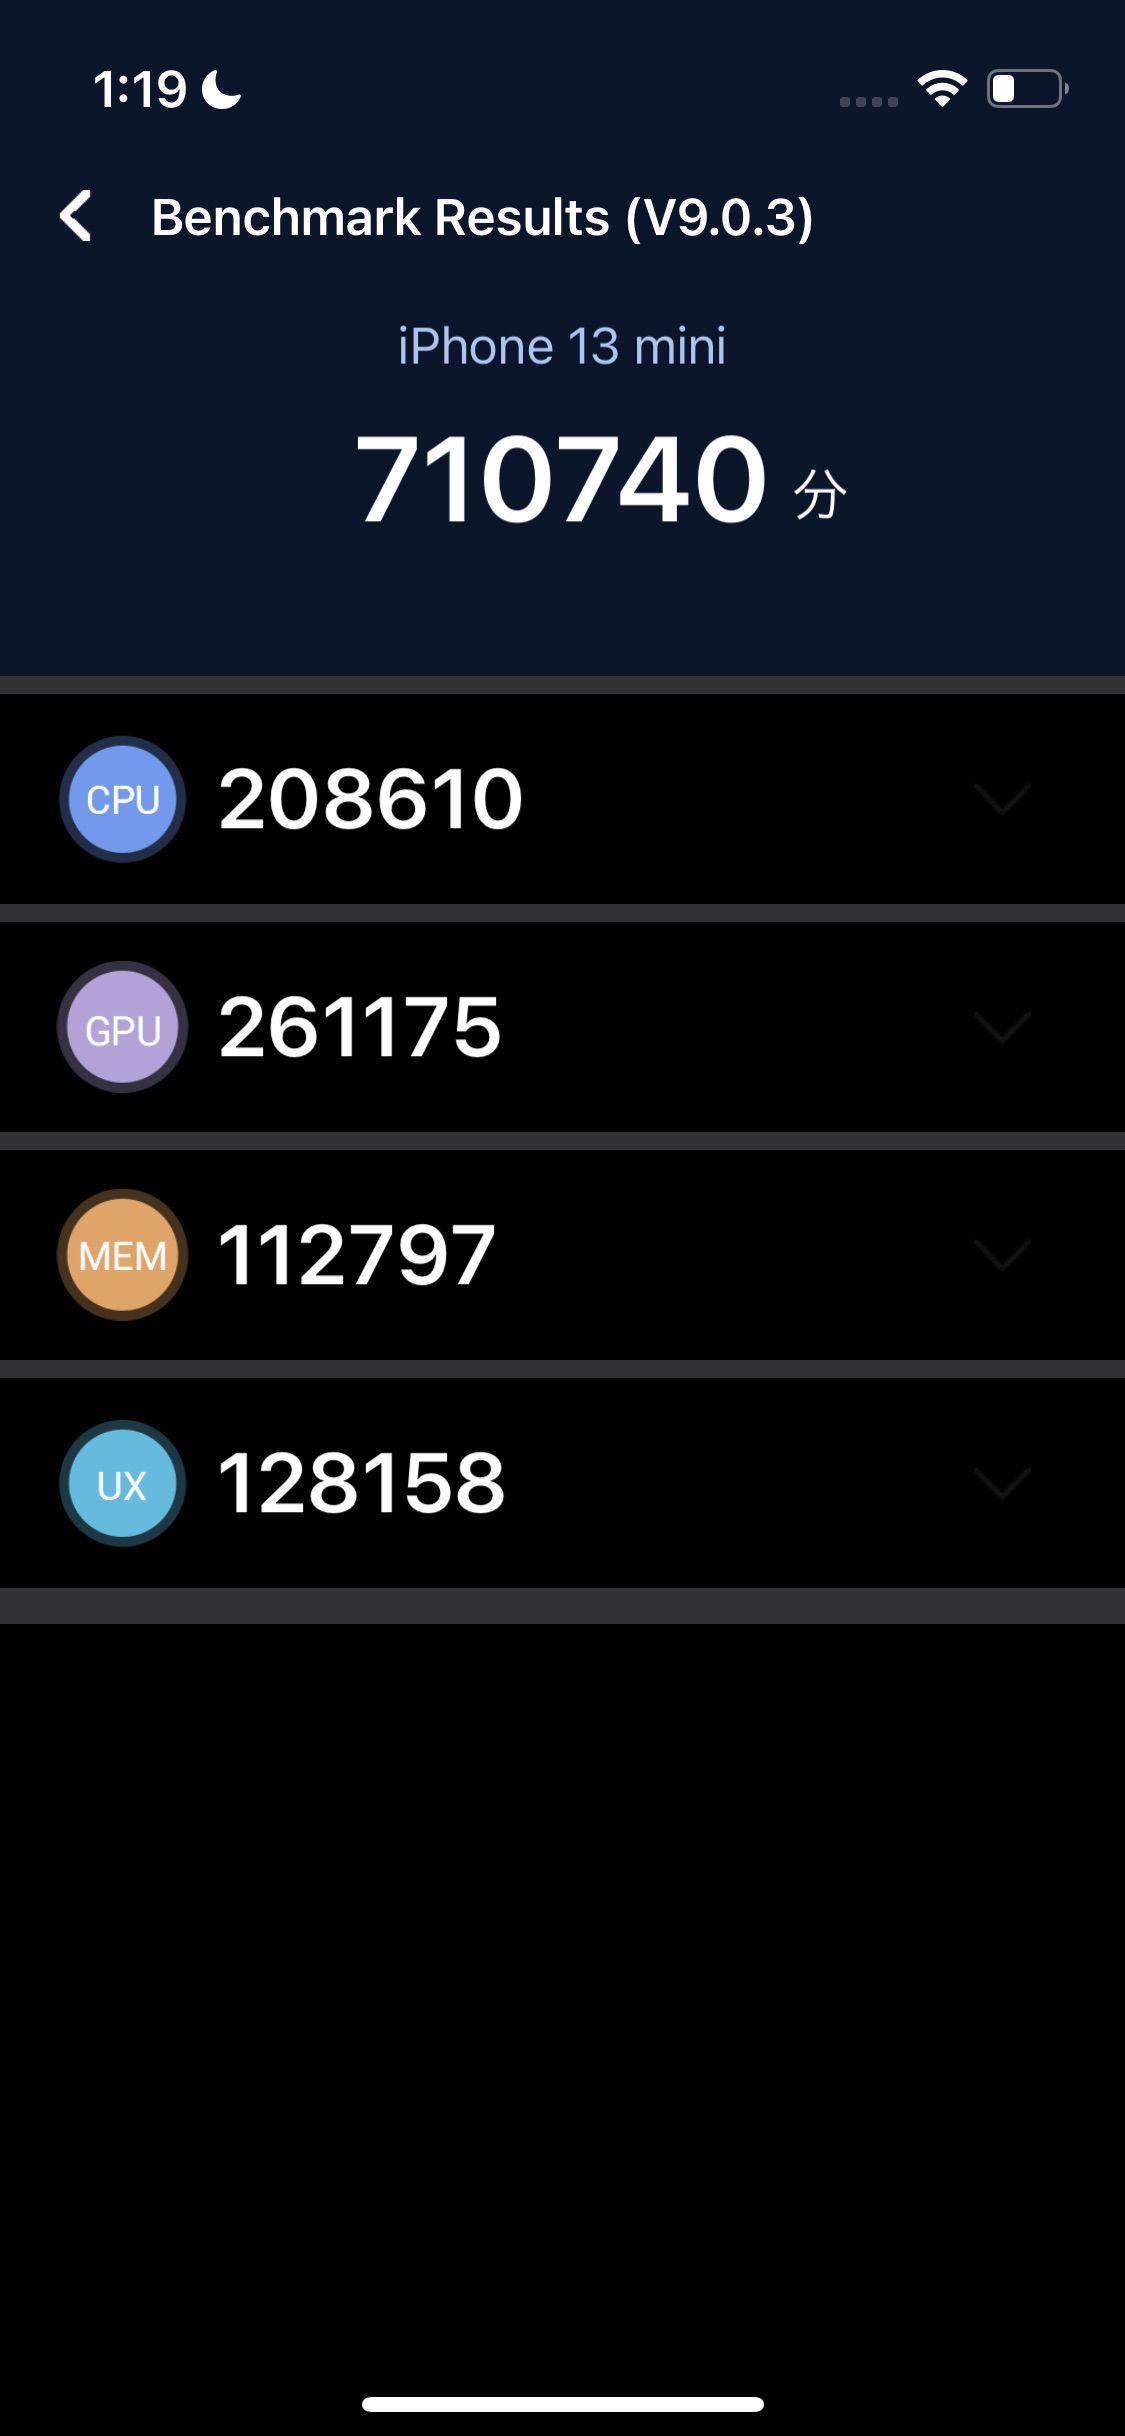 iPhone13 miniをAntutuベンチマークで測定した結果